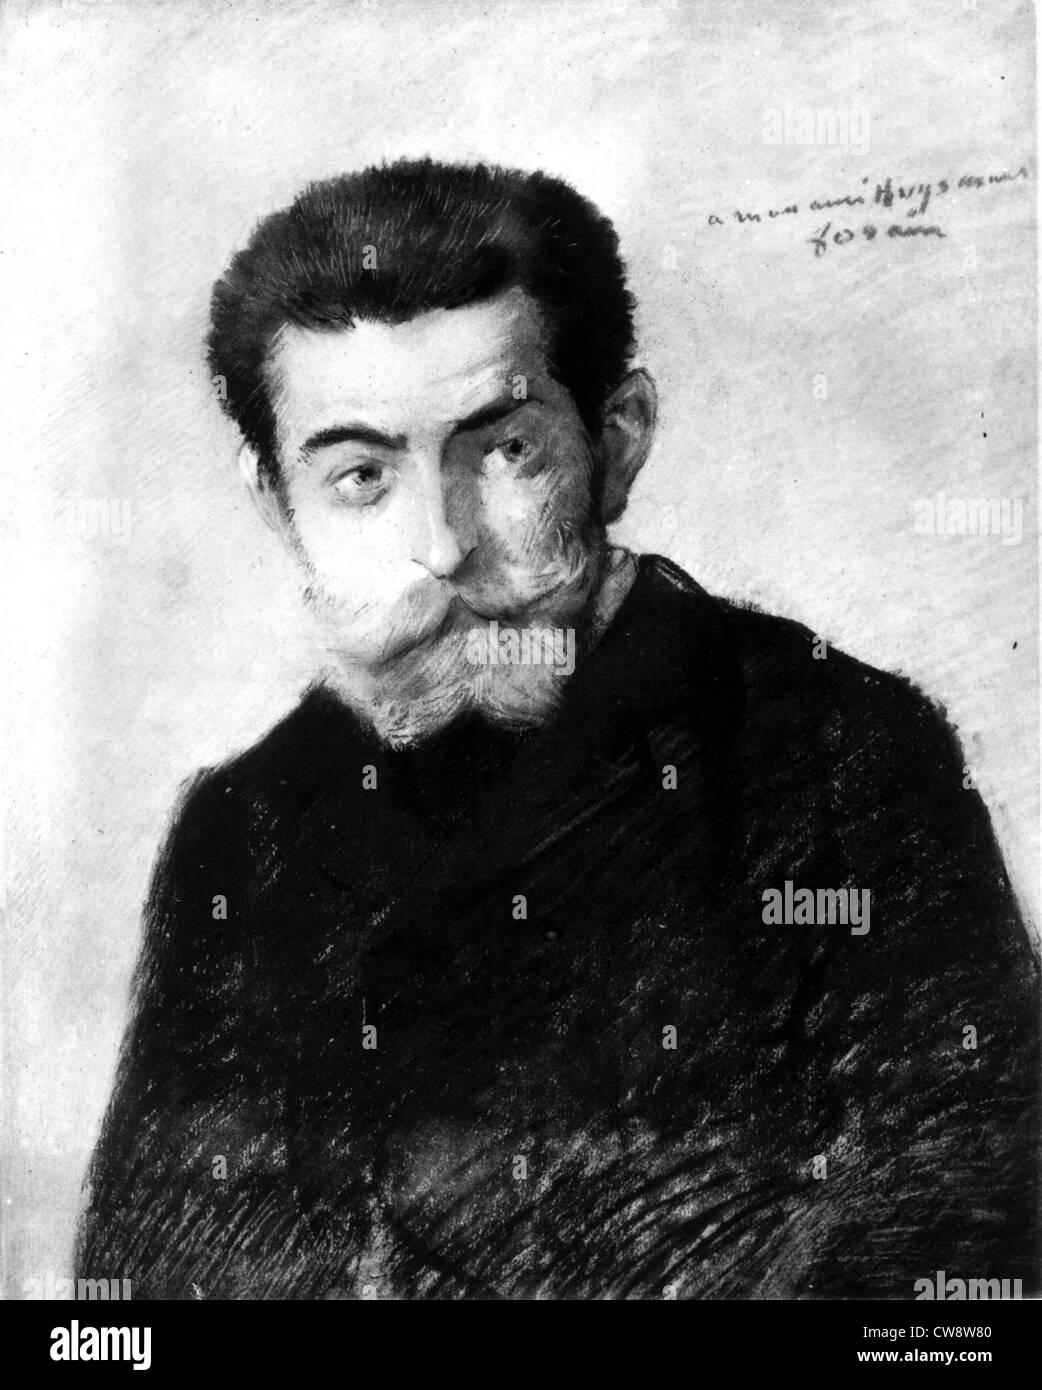 Joris-Karl Huysmans - Stock Image